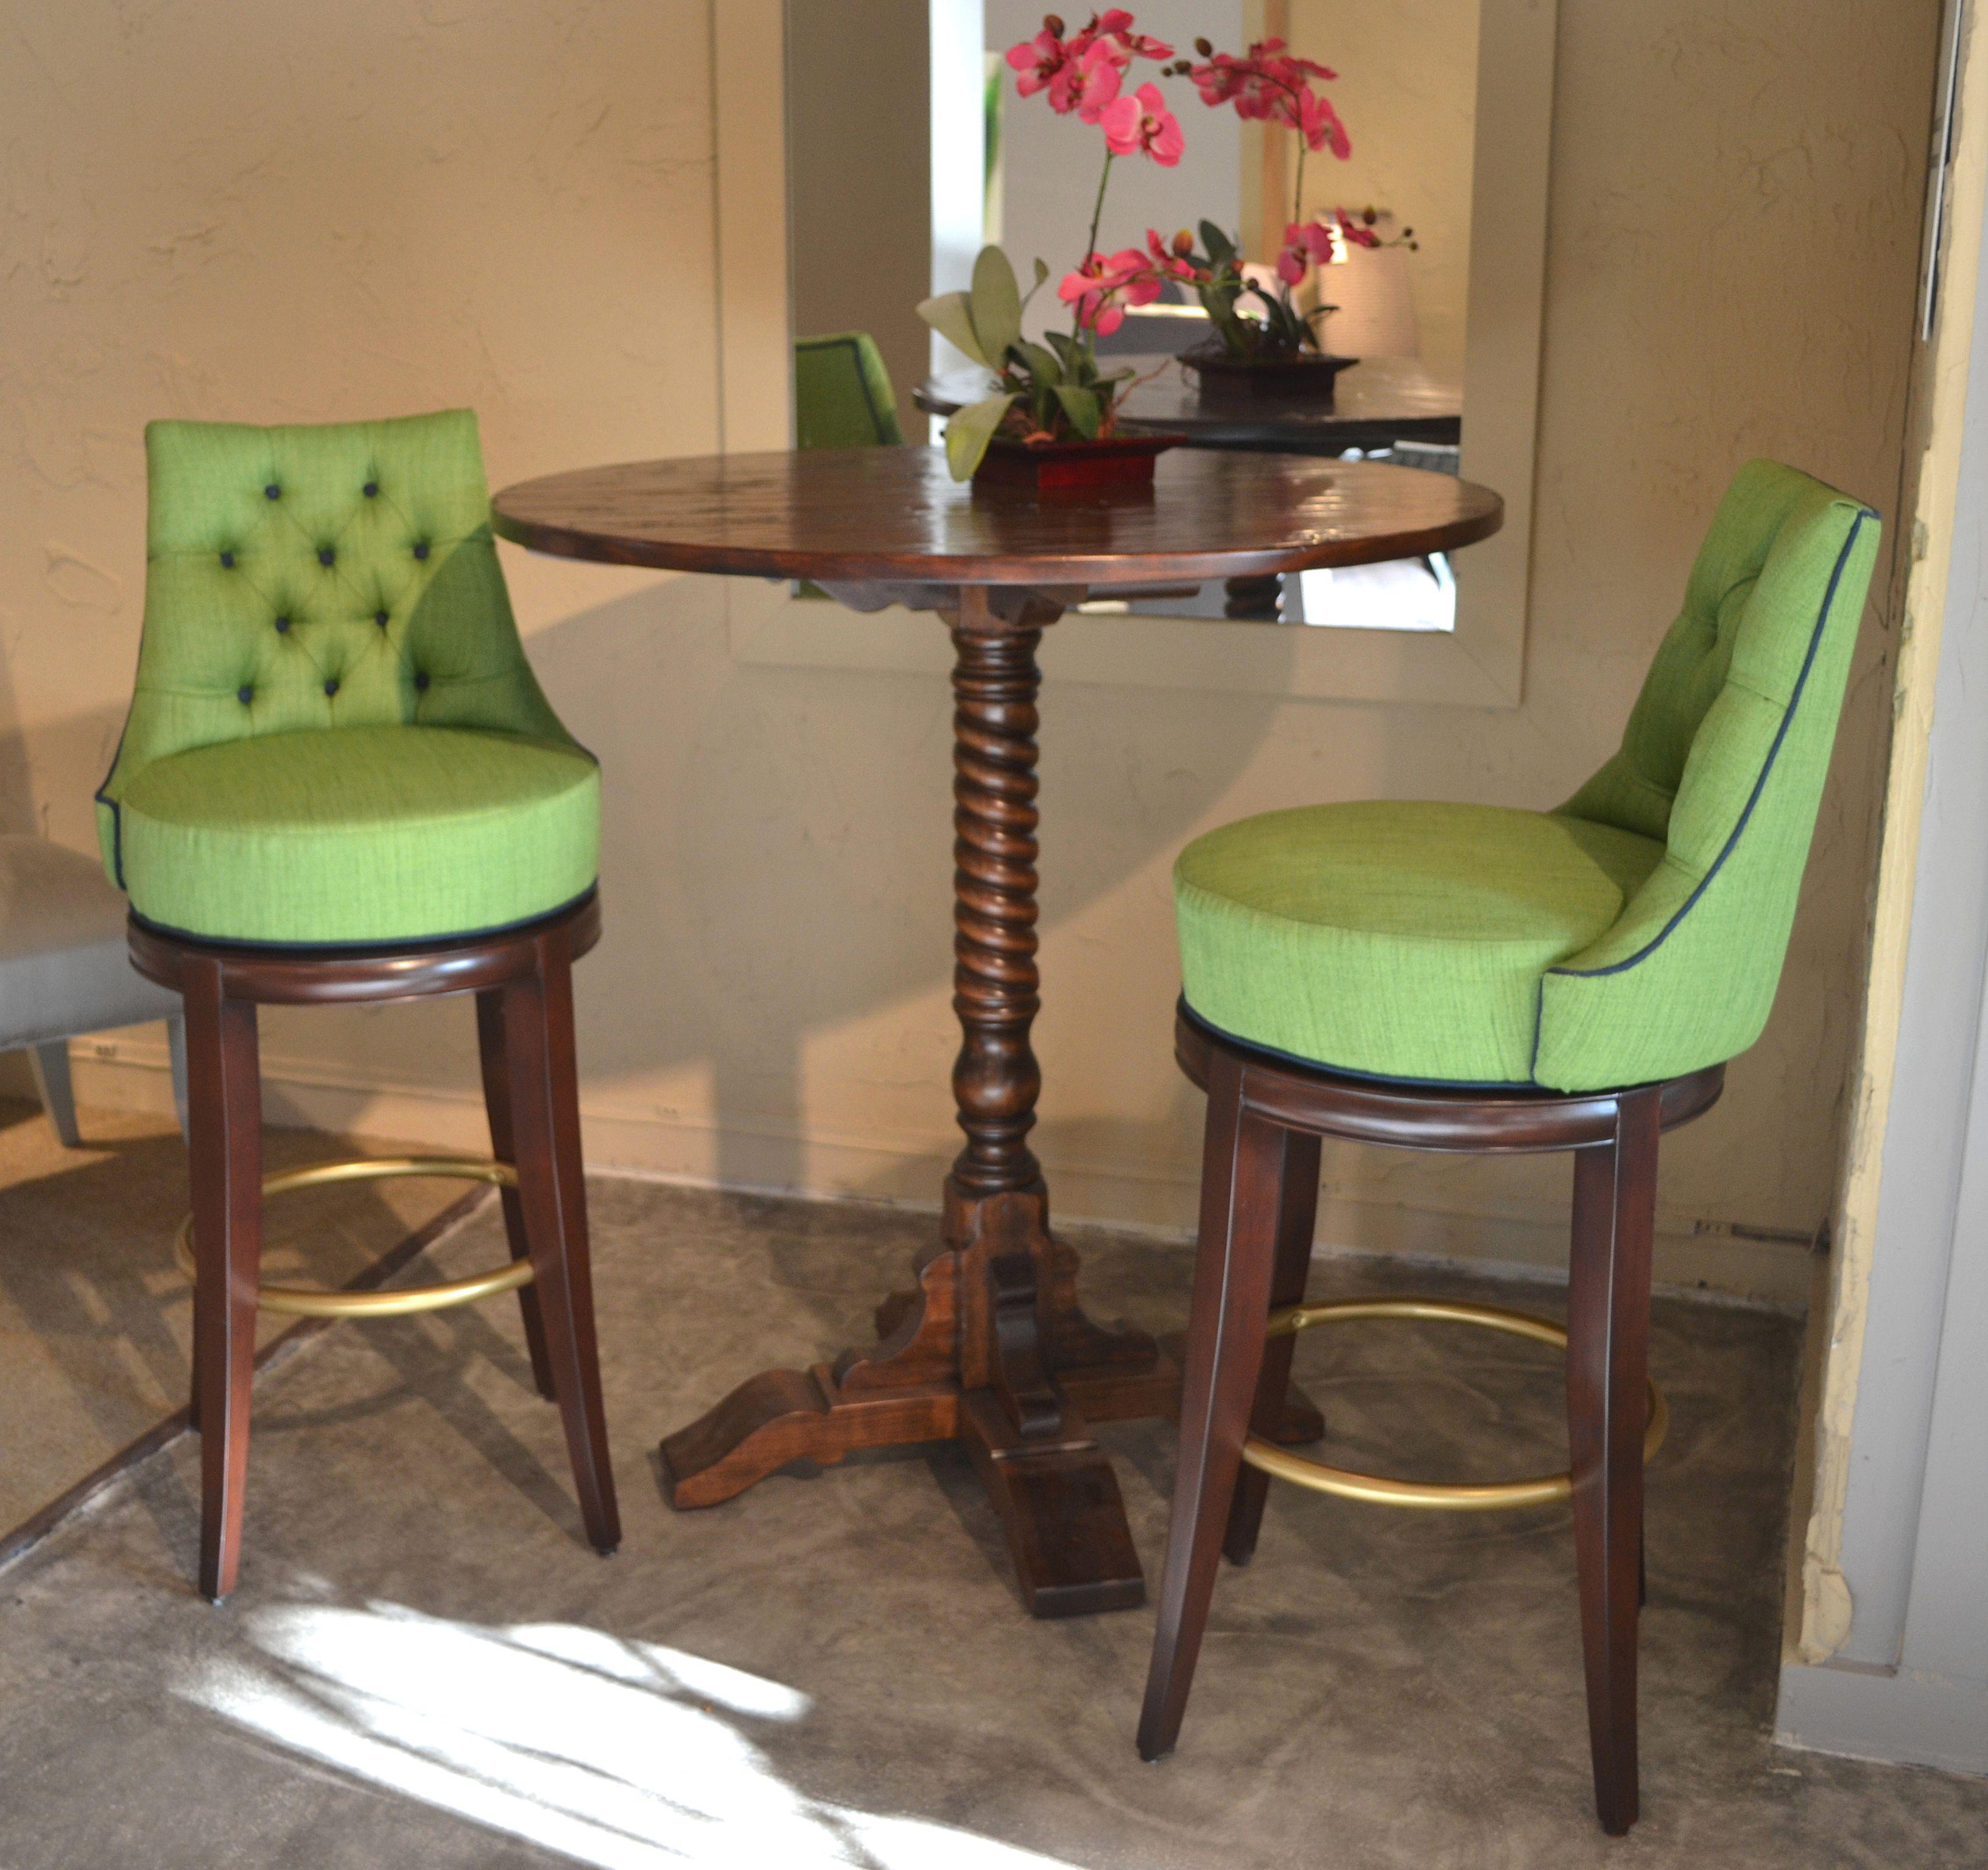 Designmaster Furniture's upholstered Harmony bar stools ...